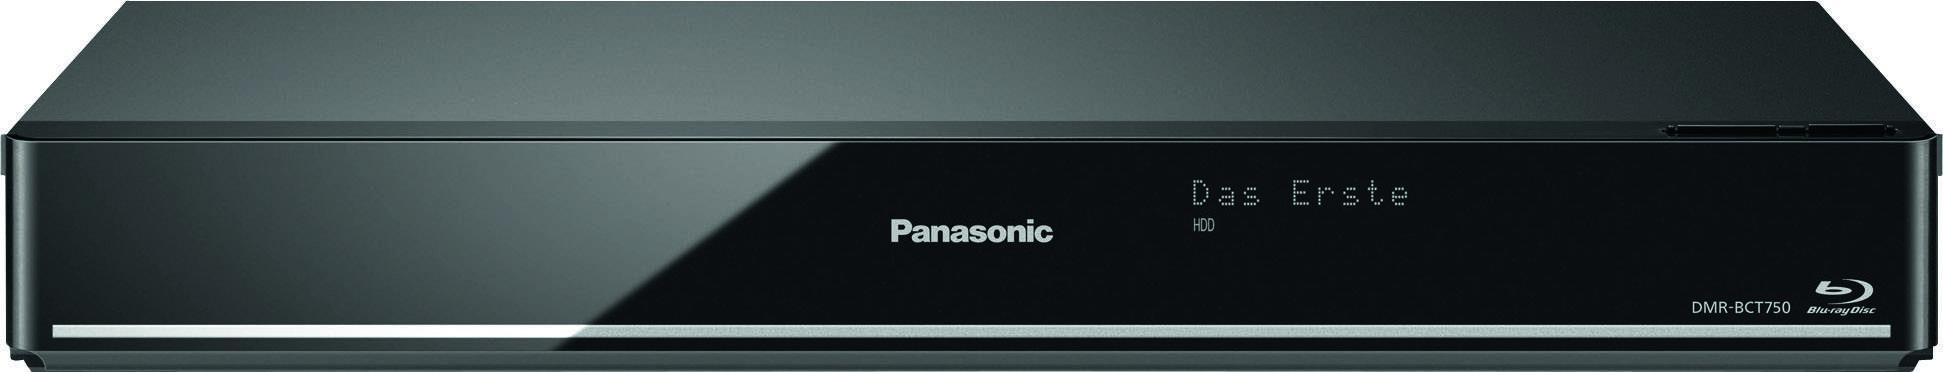 Drivers for Panasonic DMR-BCT750EG Recorder